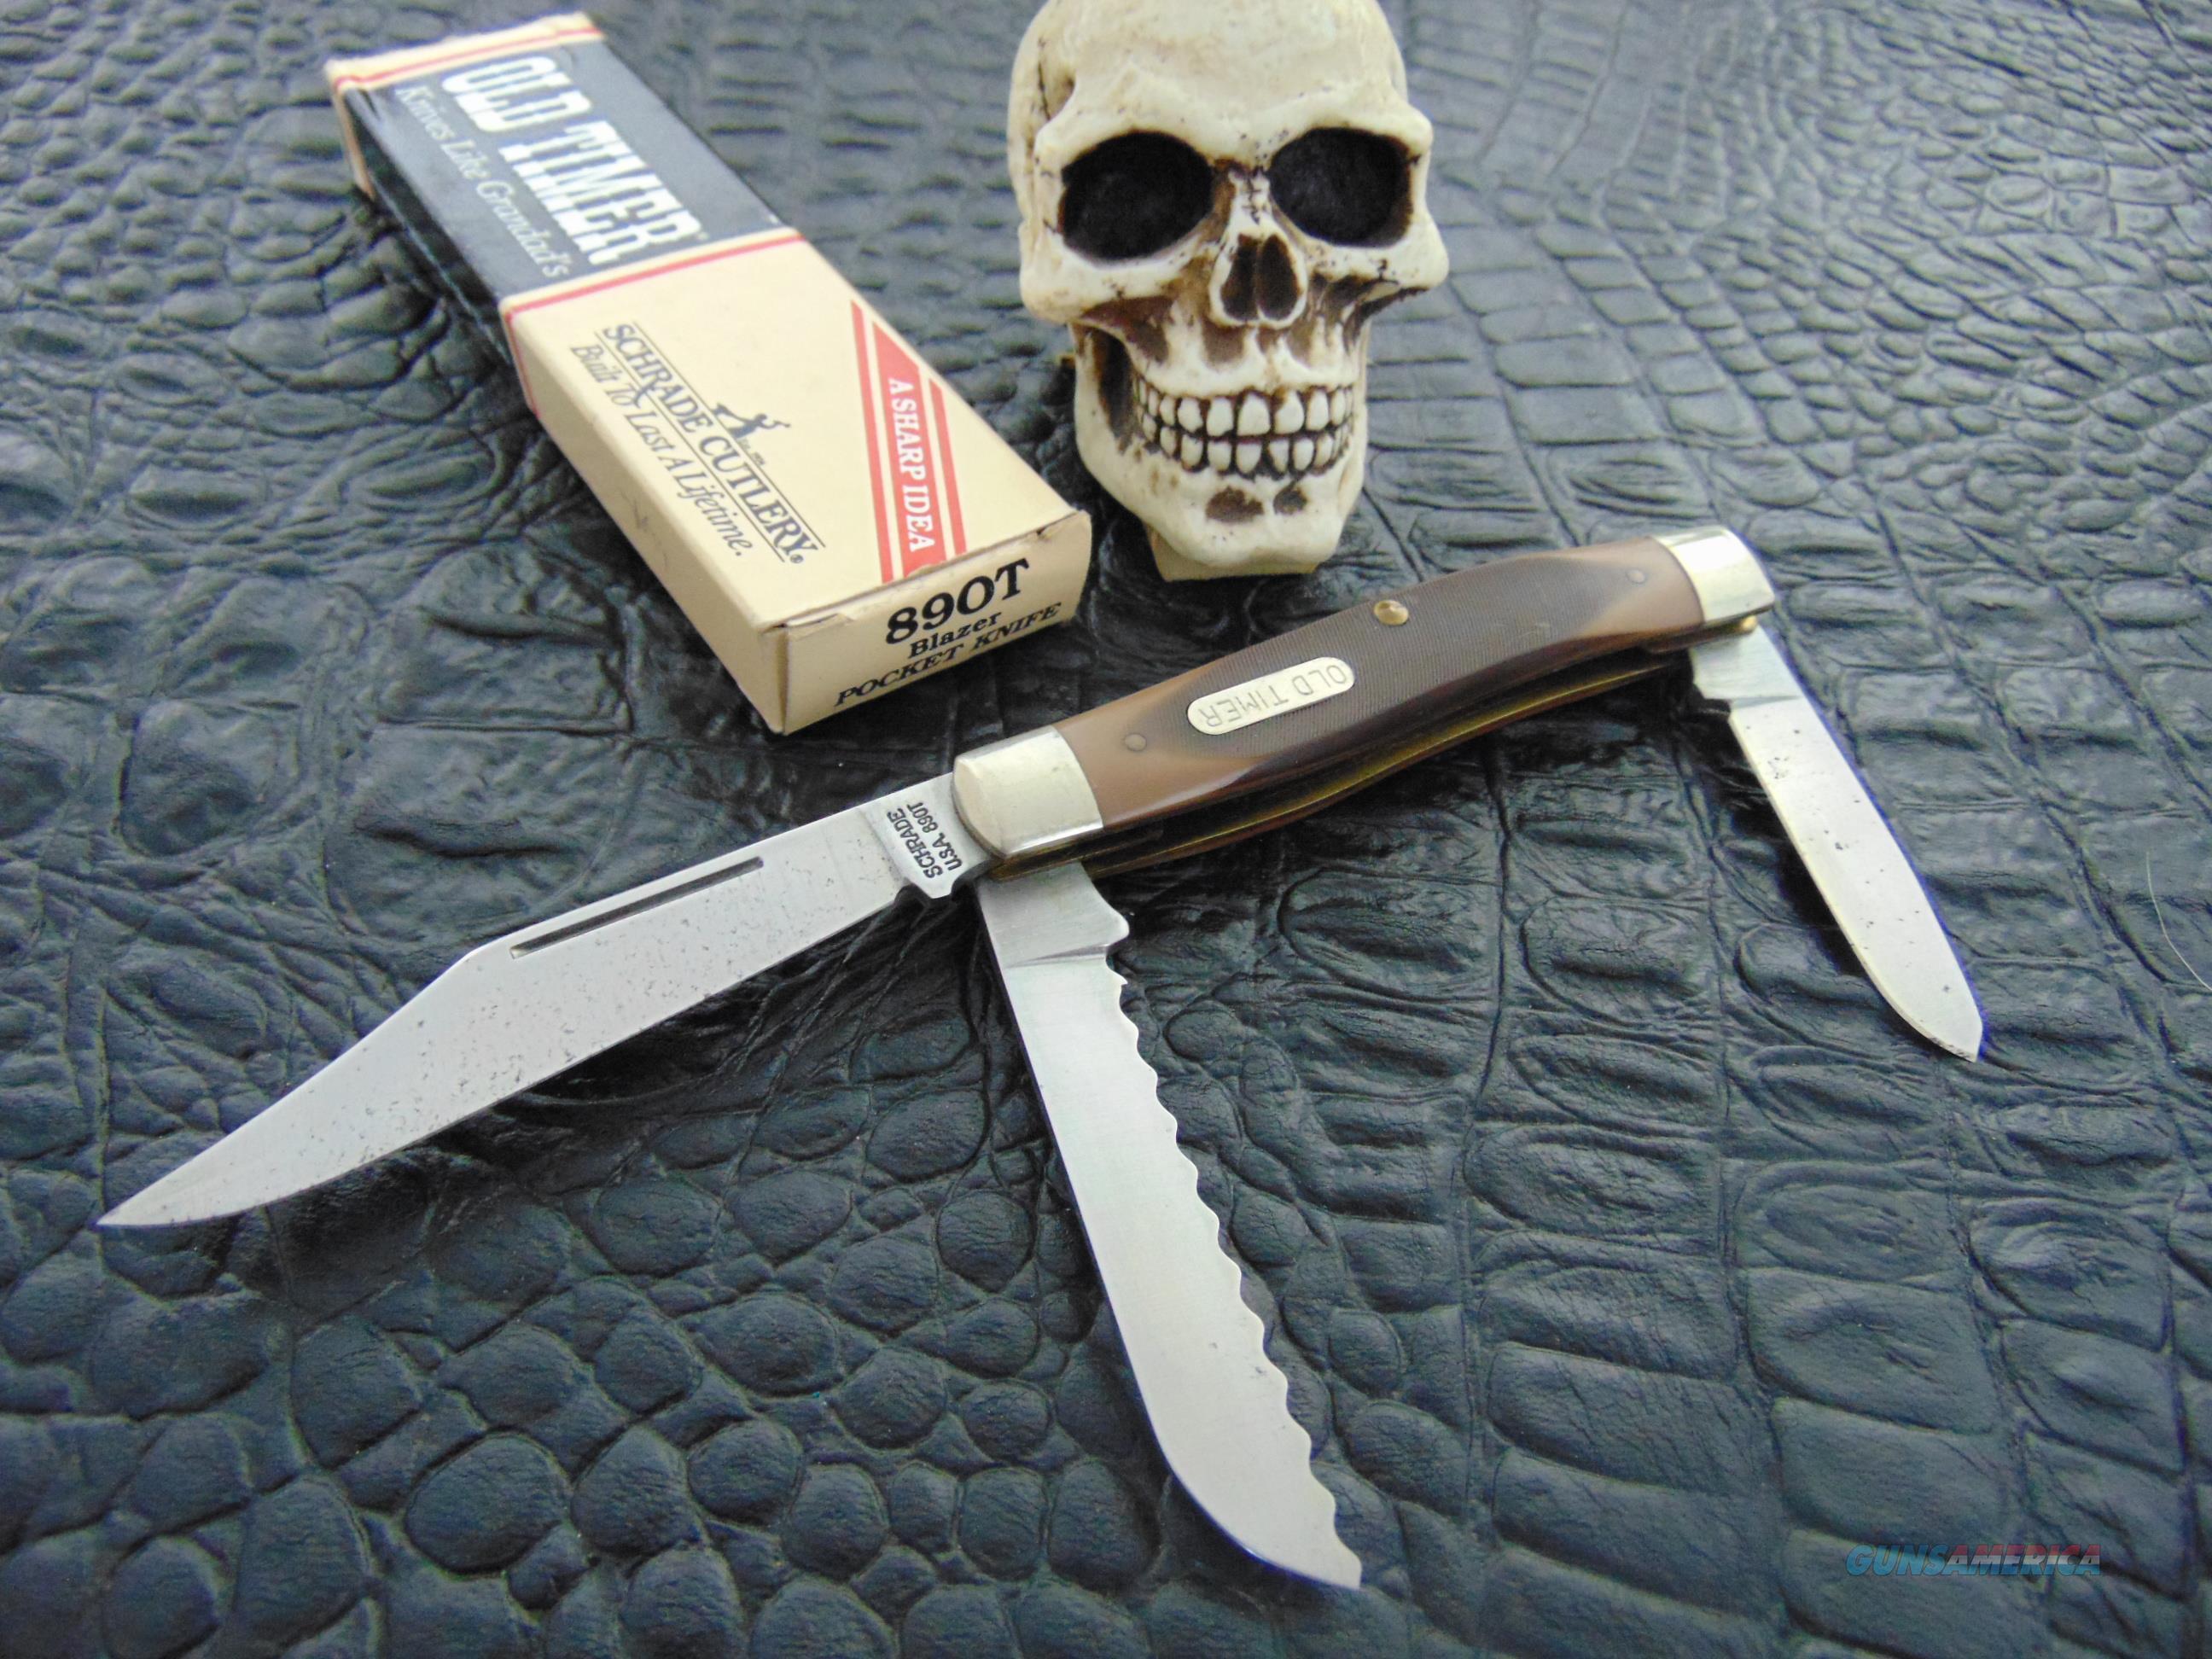 Schrade USA 890T Blazer  Non-Guns > Knives/Swords > Knives > Folding Blade > Hand Made